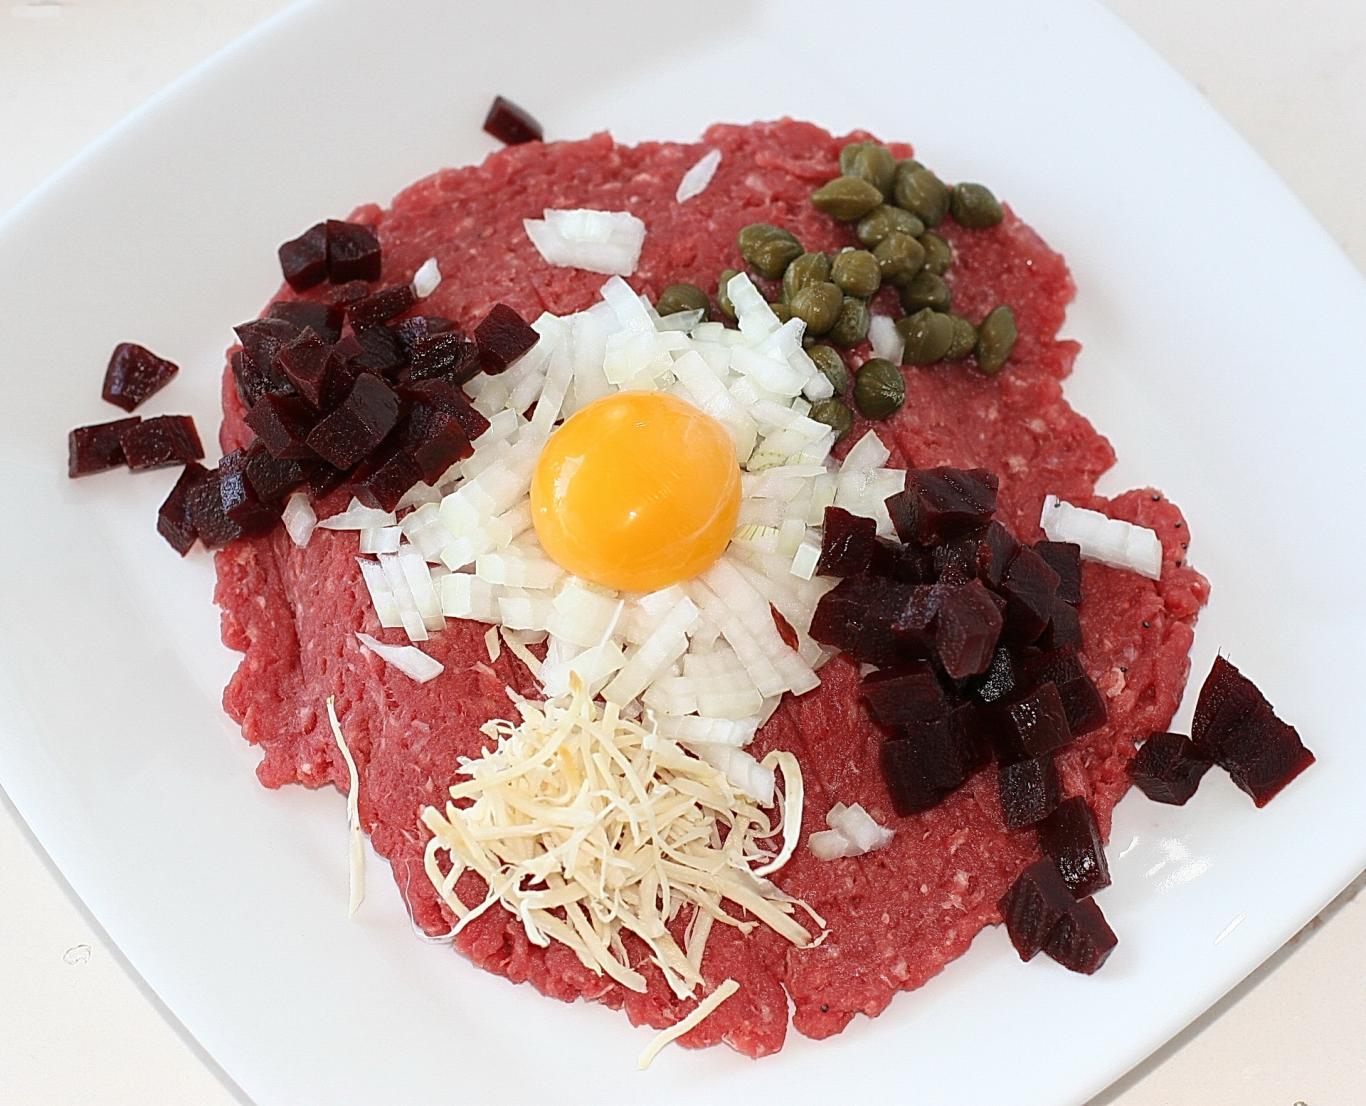 Steak tartar con carne picada, huevo y otros ingredientes